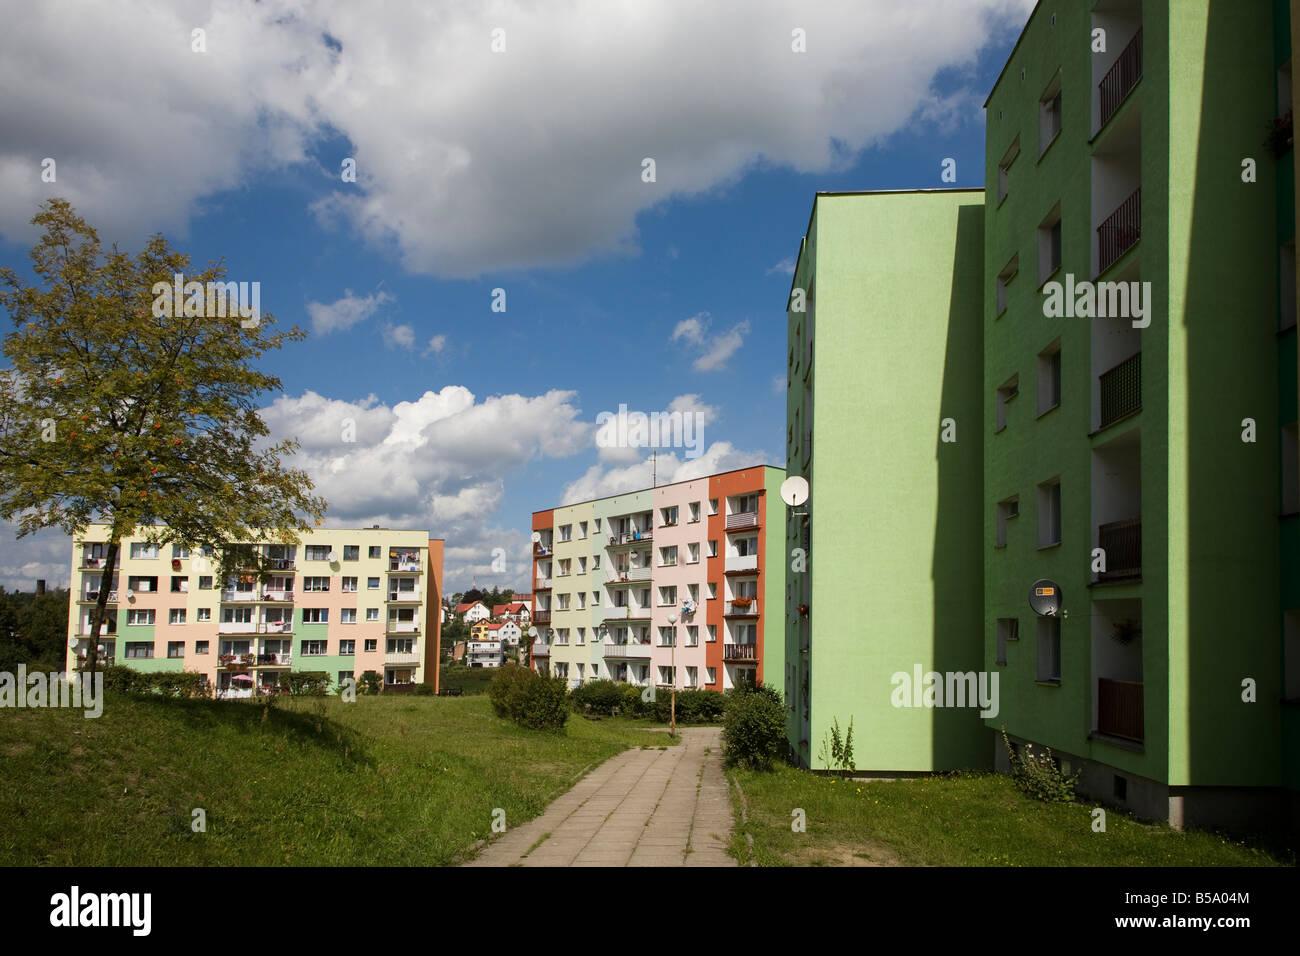 Brightly painted blocks of flats on housing estate Miastko Poland Stock Photo